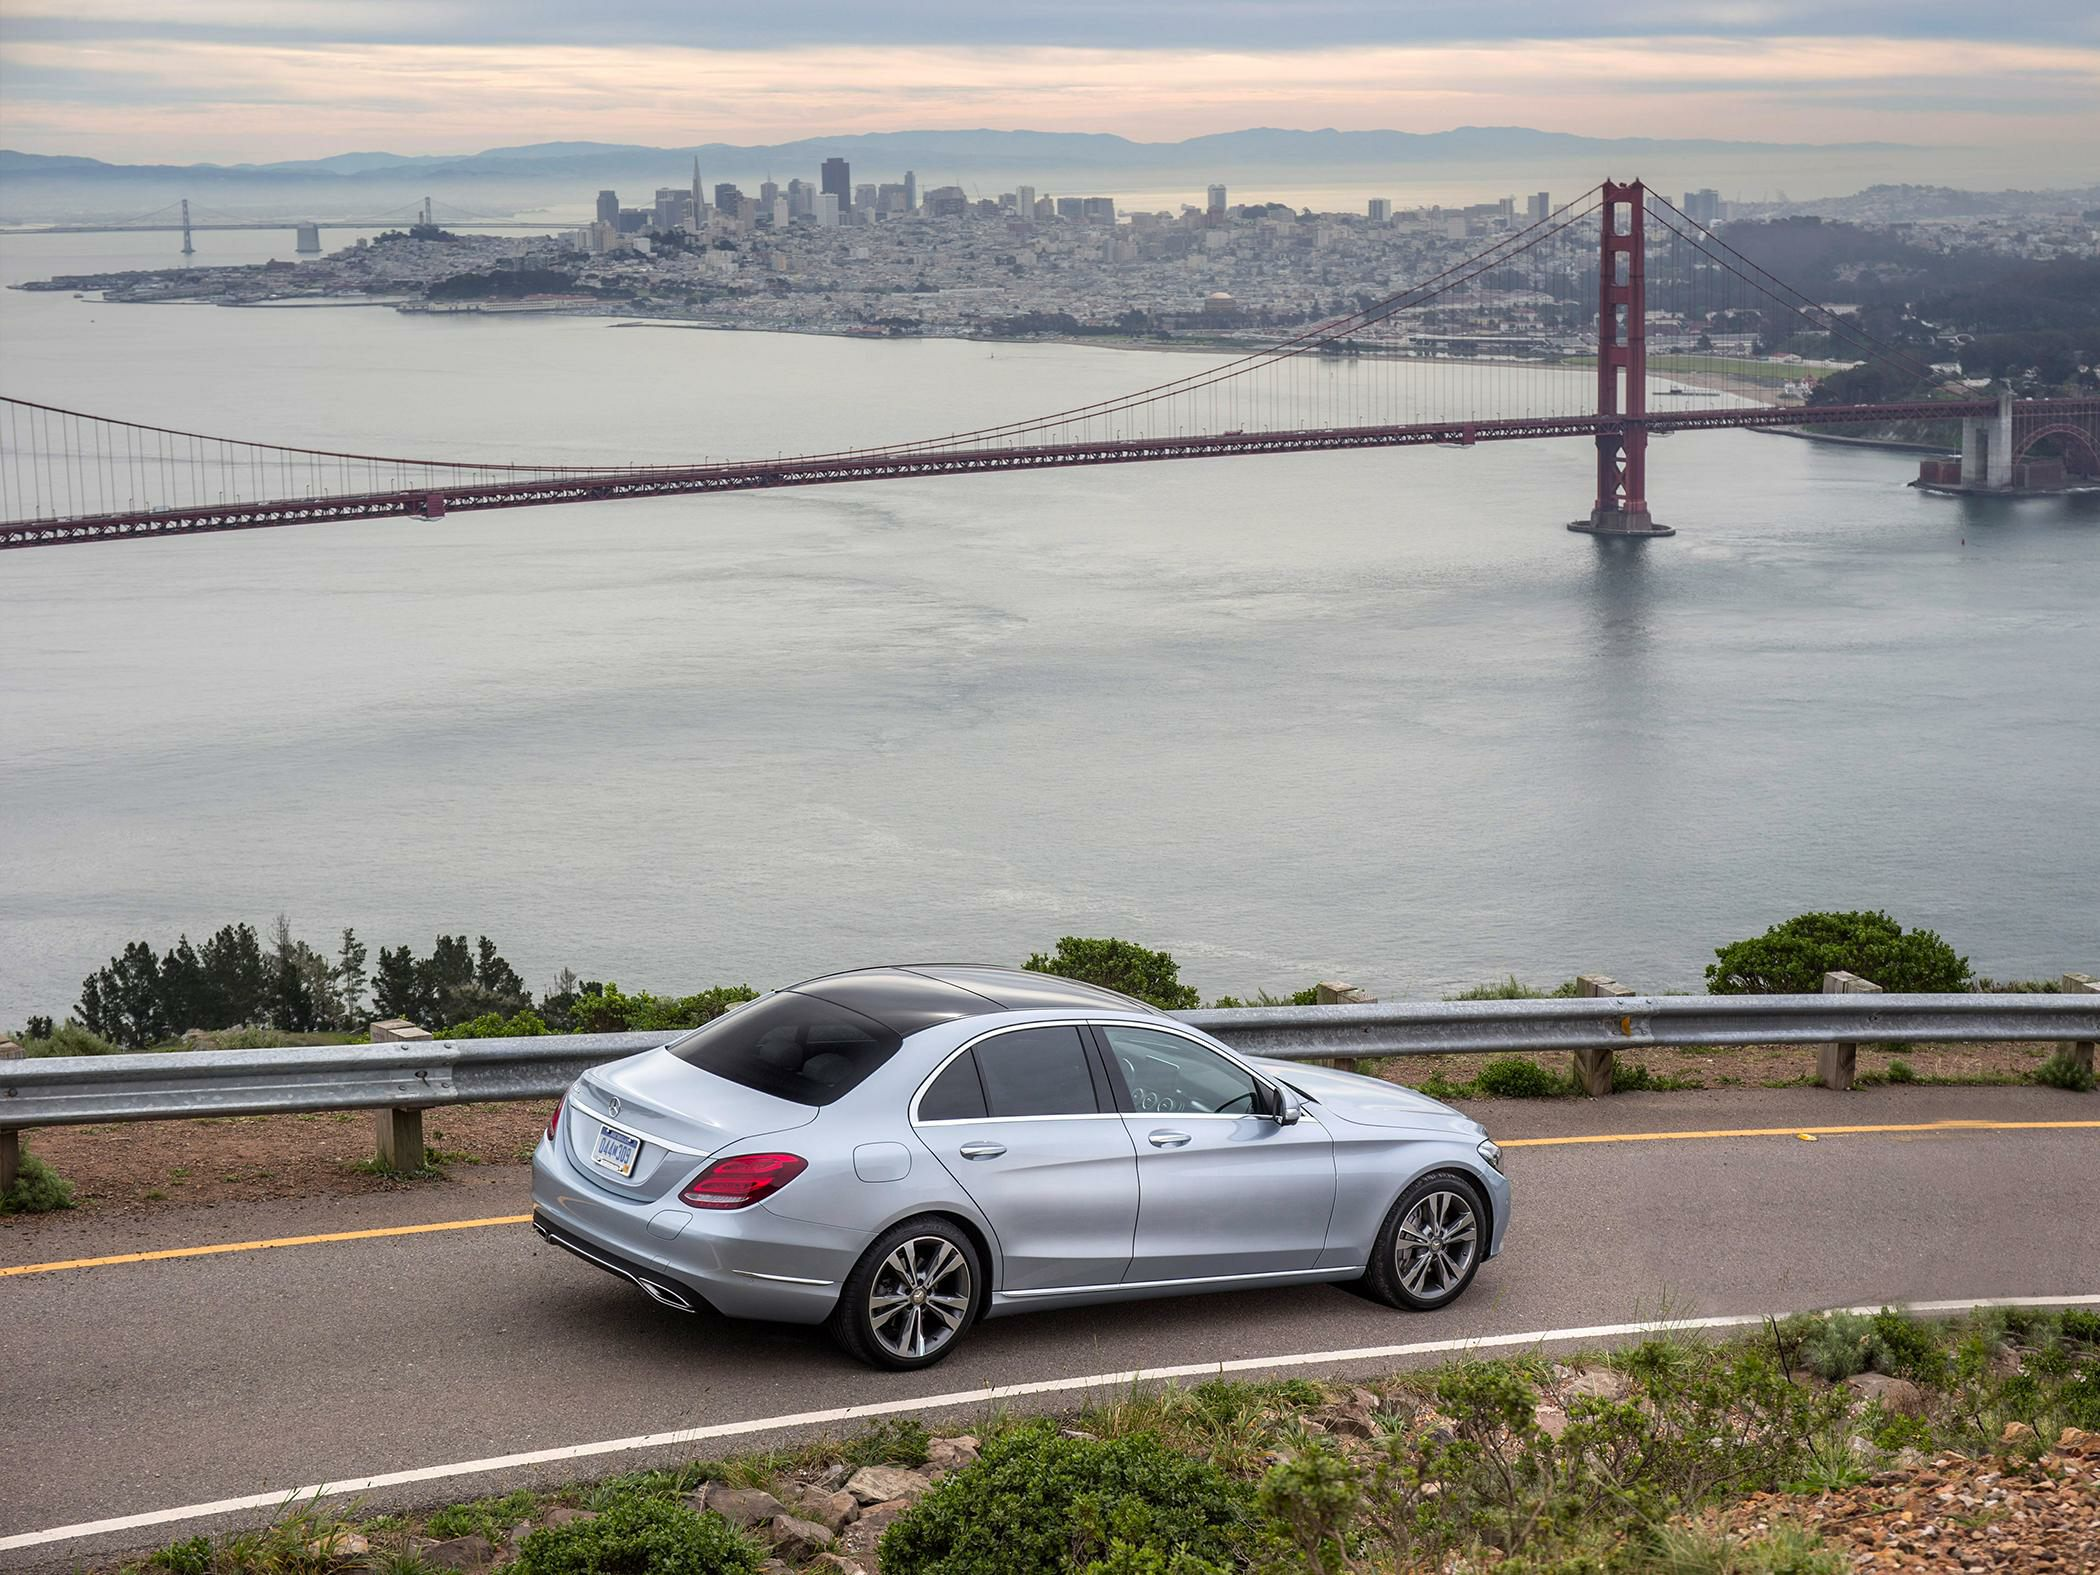 2016 bmw 330e plug in hybrid first drive autoblog 2018 mercedes benz c class